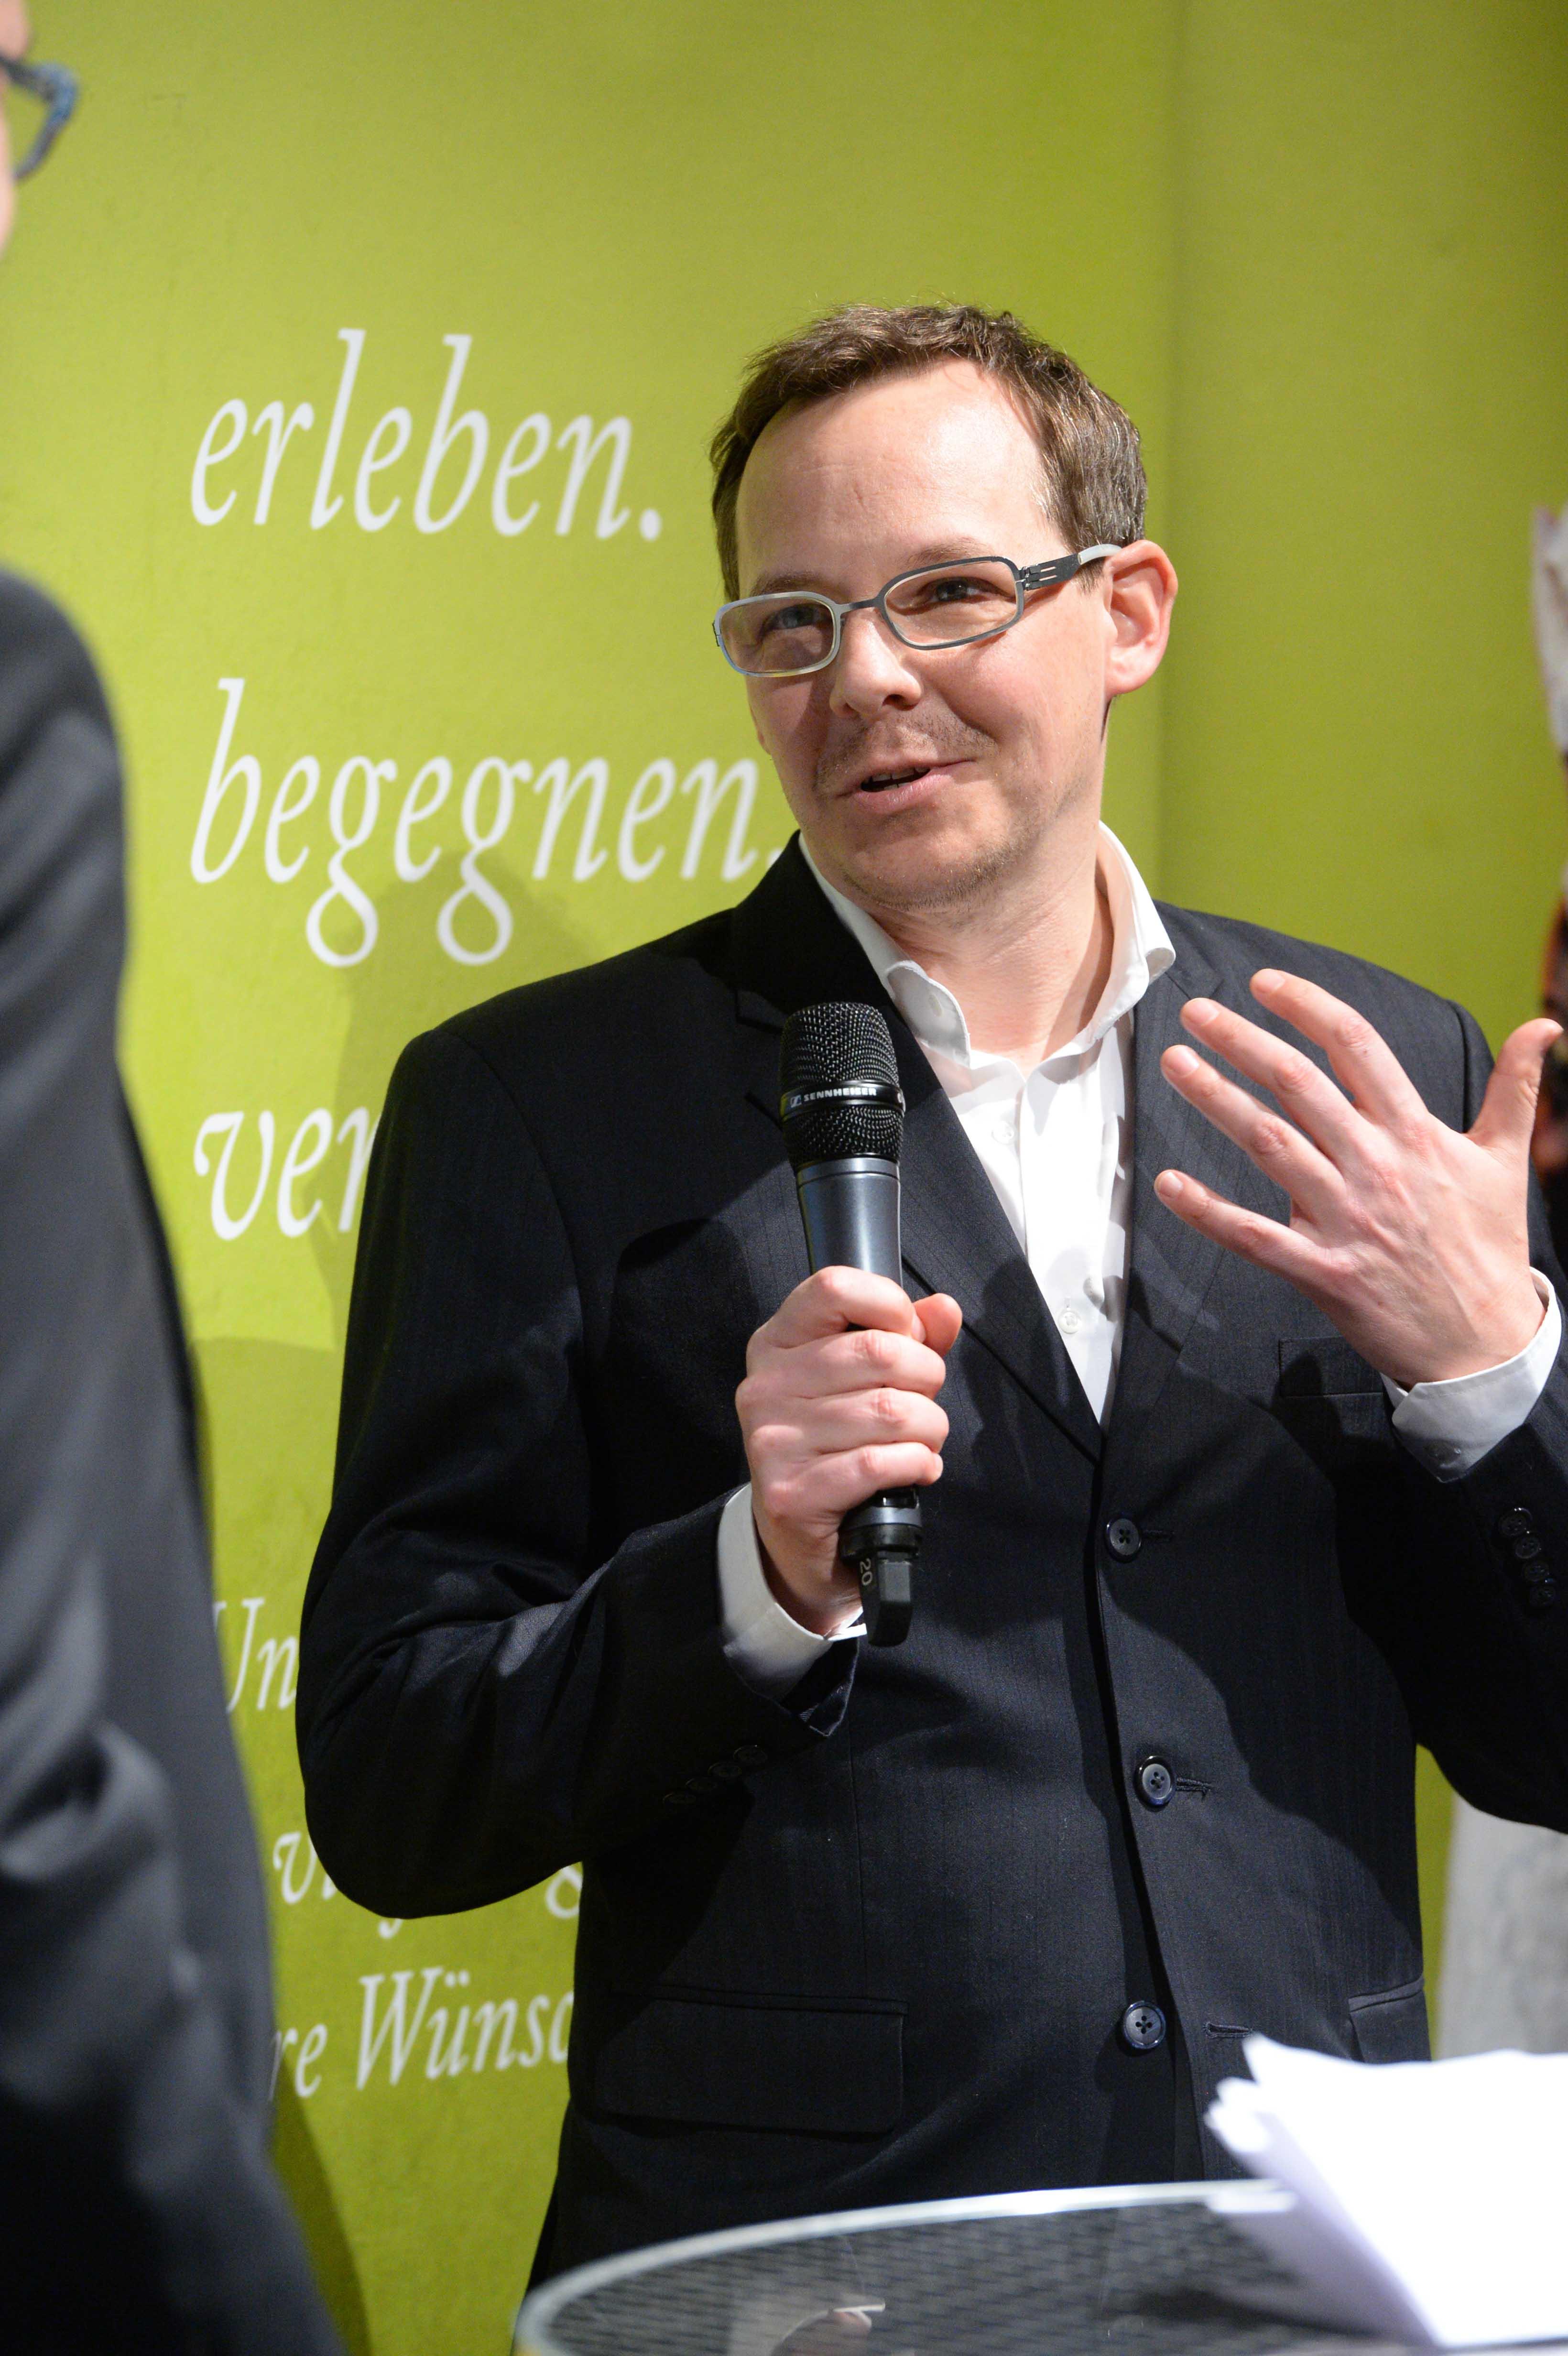 Columbus Film Preisverleihung 2015 Gold Christian Schidlowski ZDF Arte Portrait web